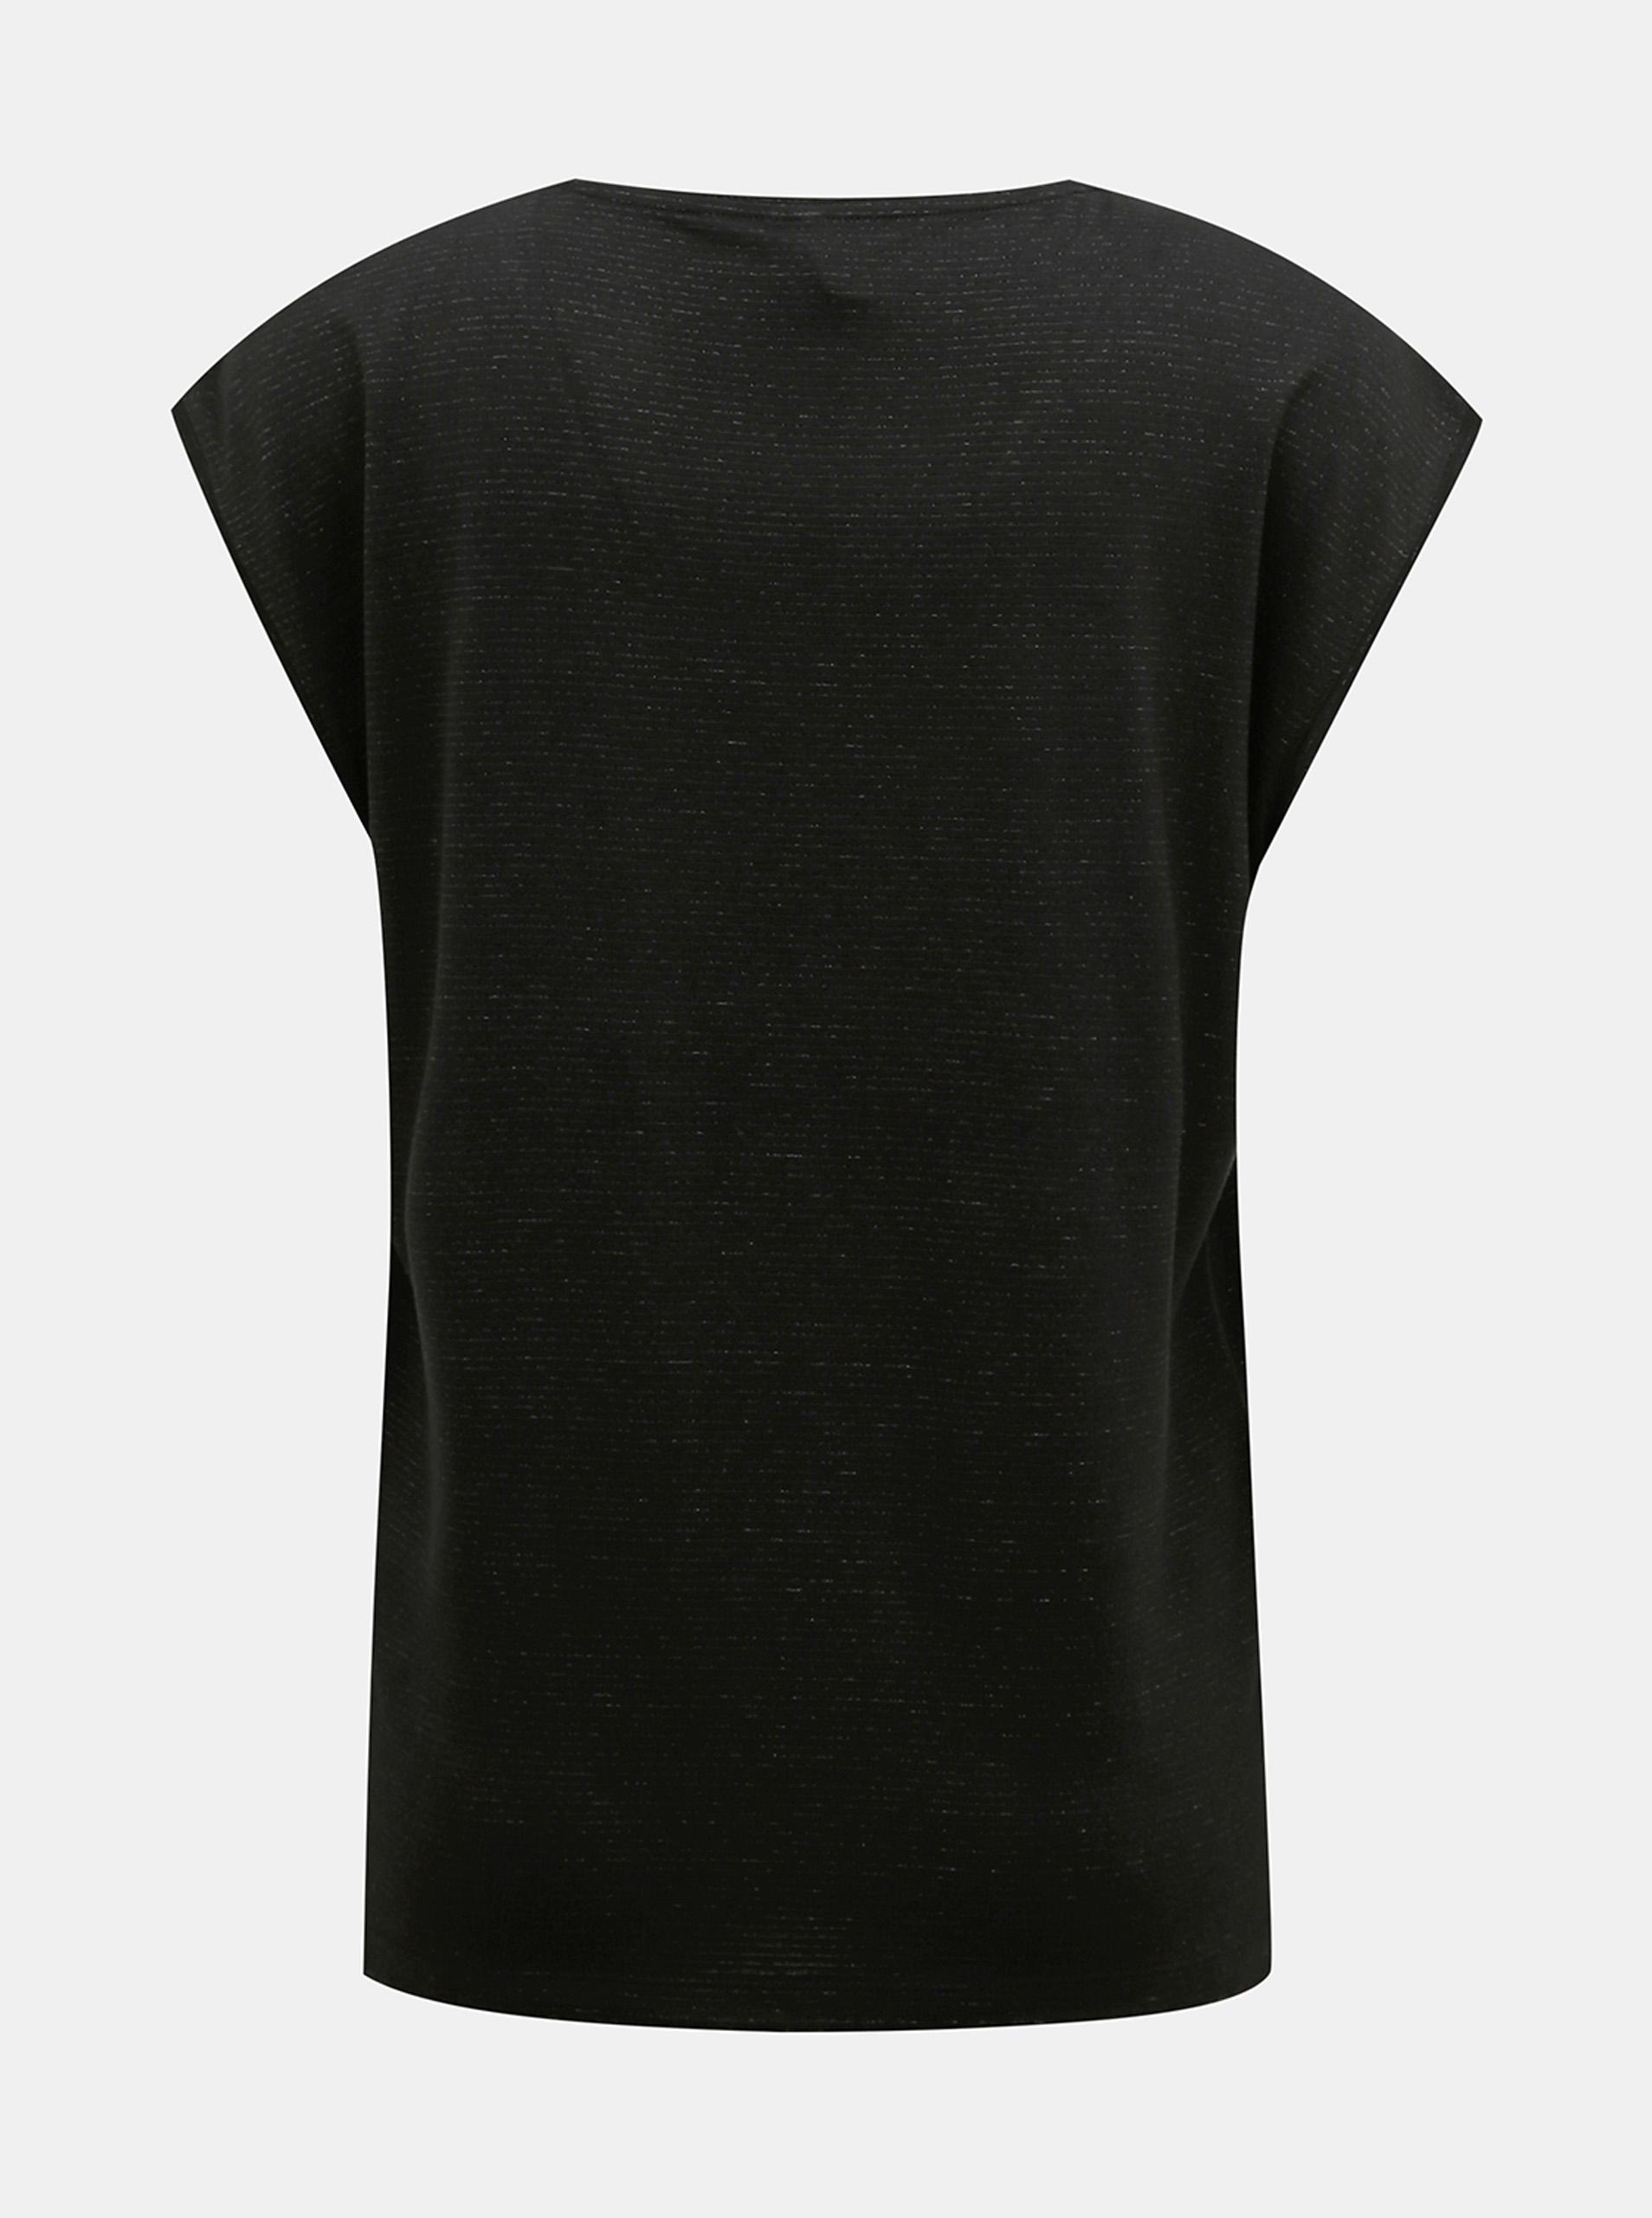 Crna majica s metalnim vlaknima komada